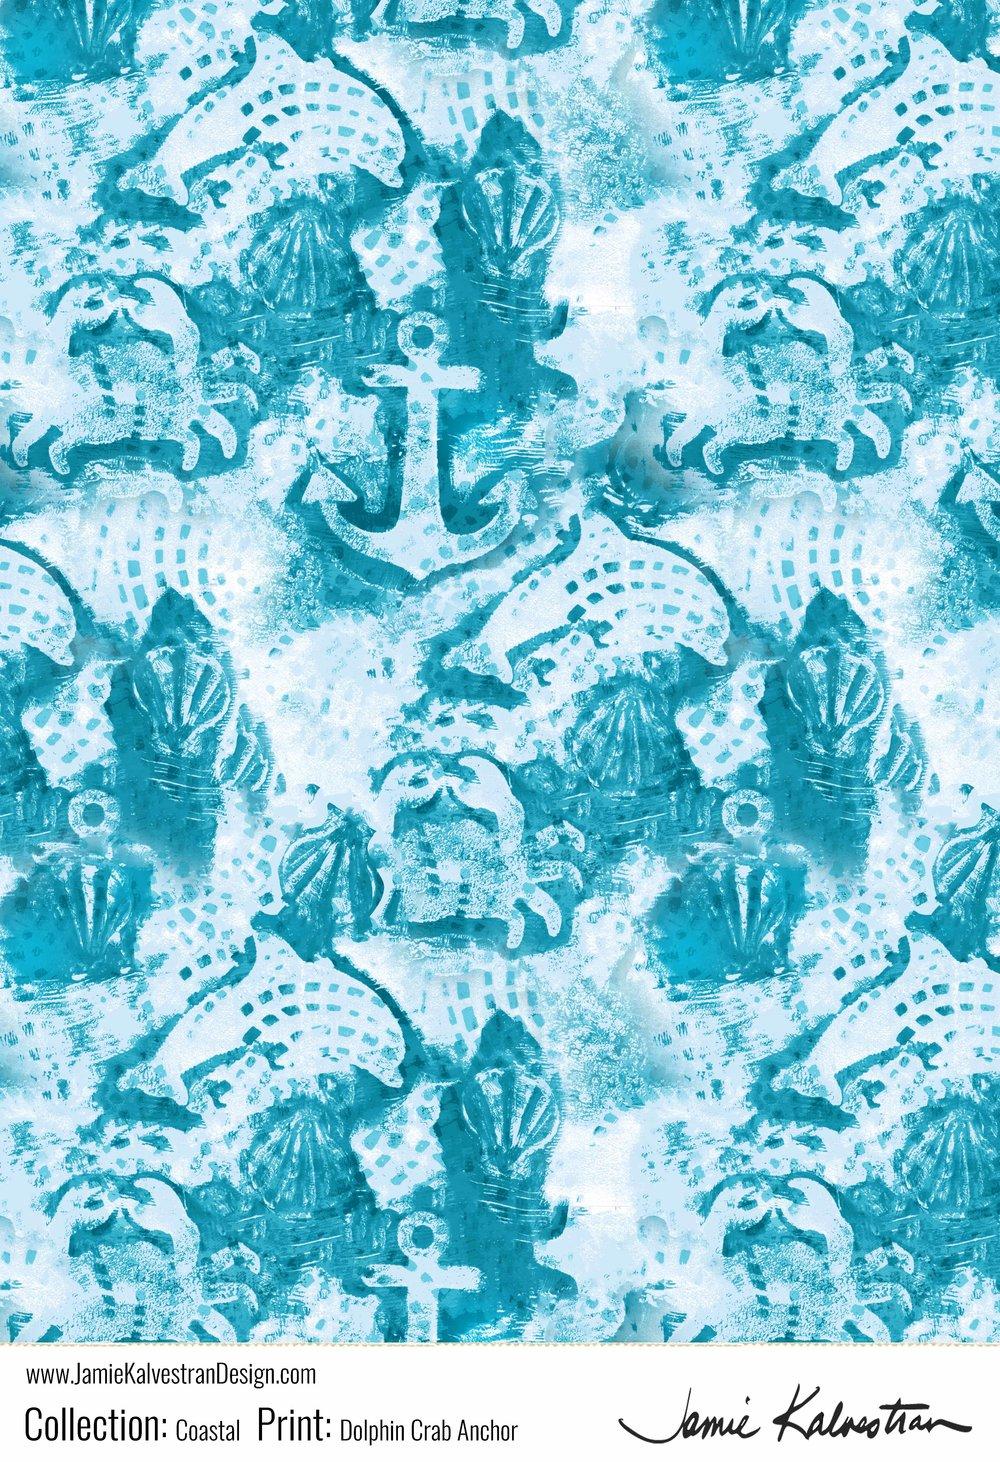 Jamie_Kalvestran_Coastal_Dolphin_Crab_Anchor.jpg